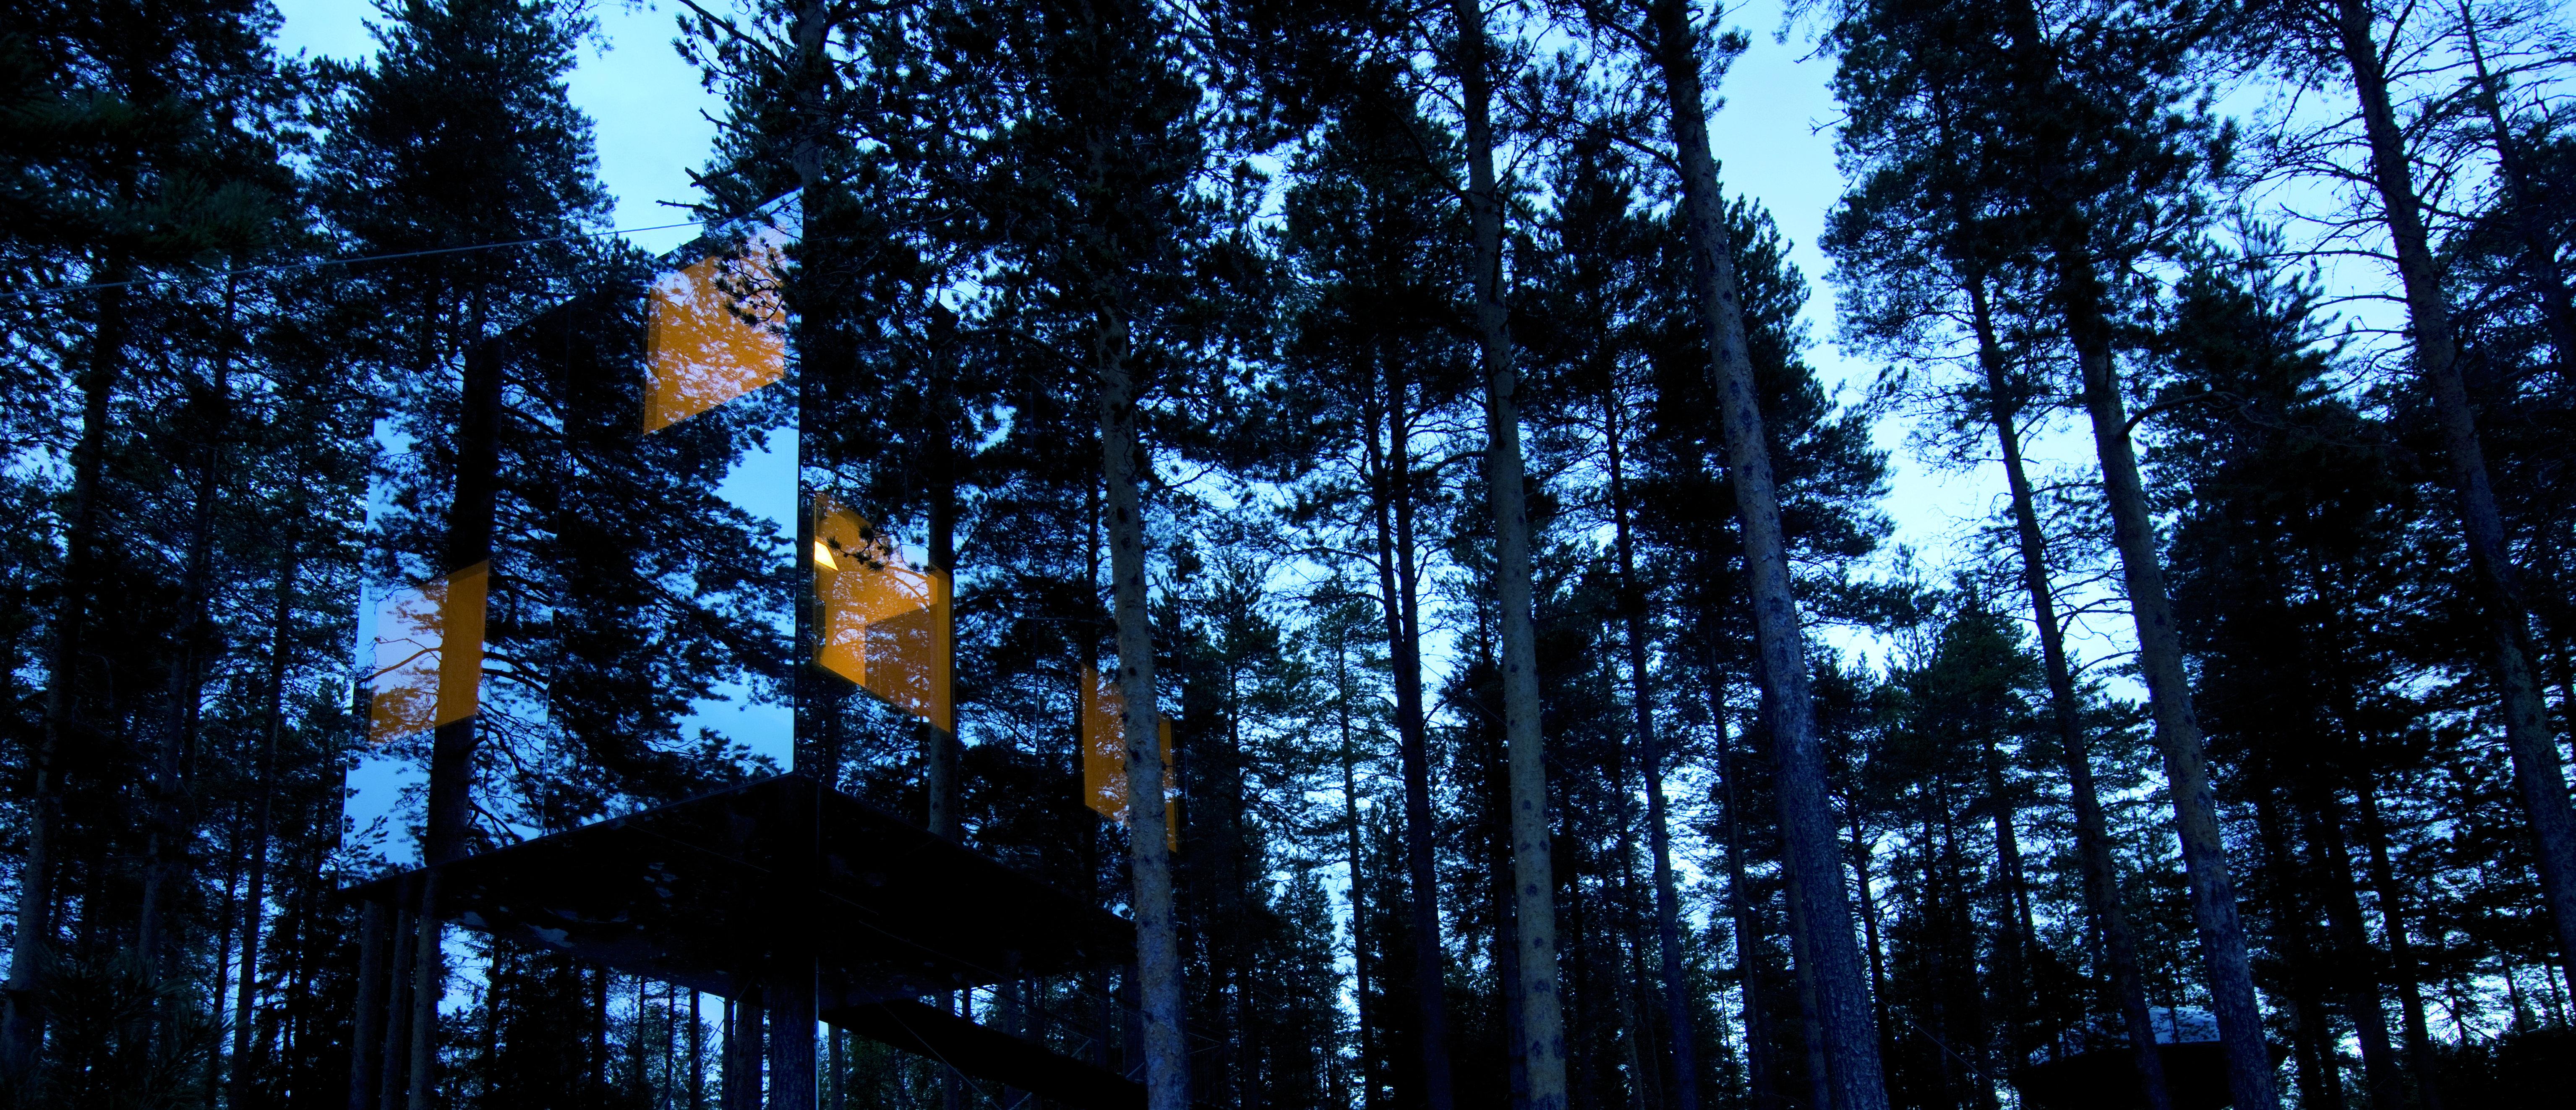 mirror_cube_exterior_treehotel